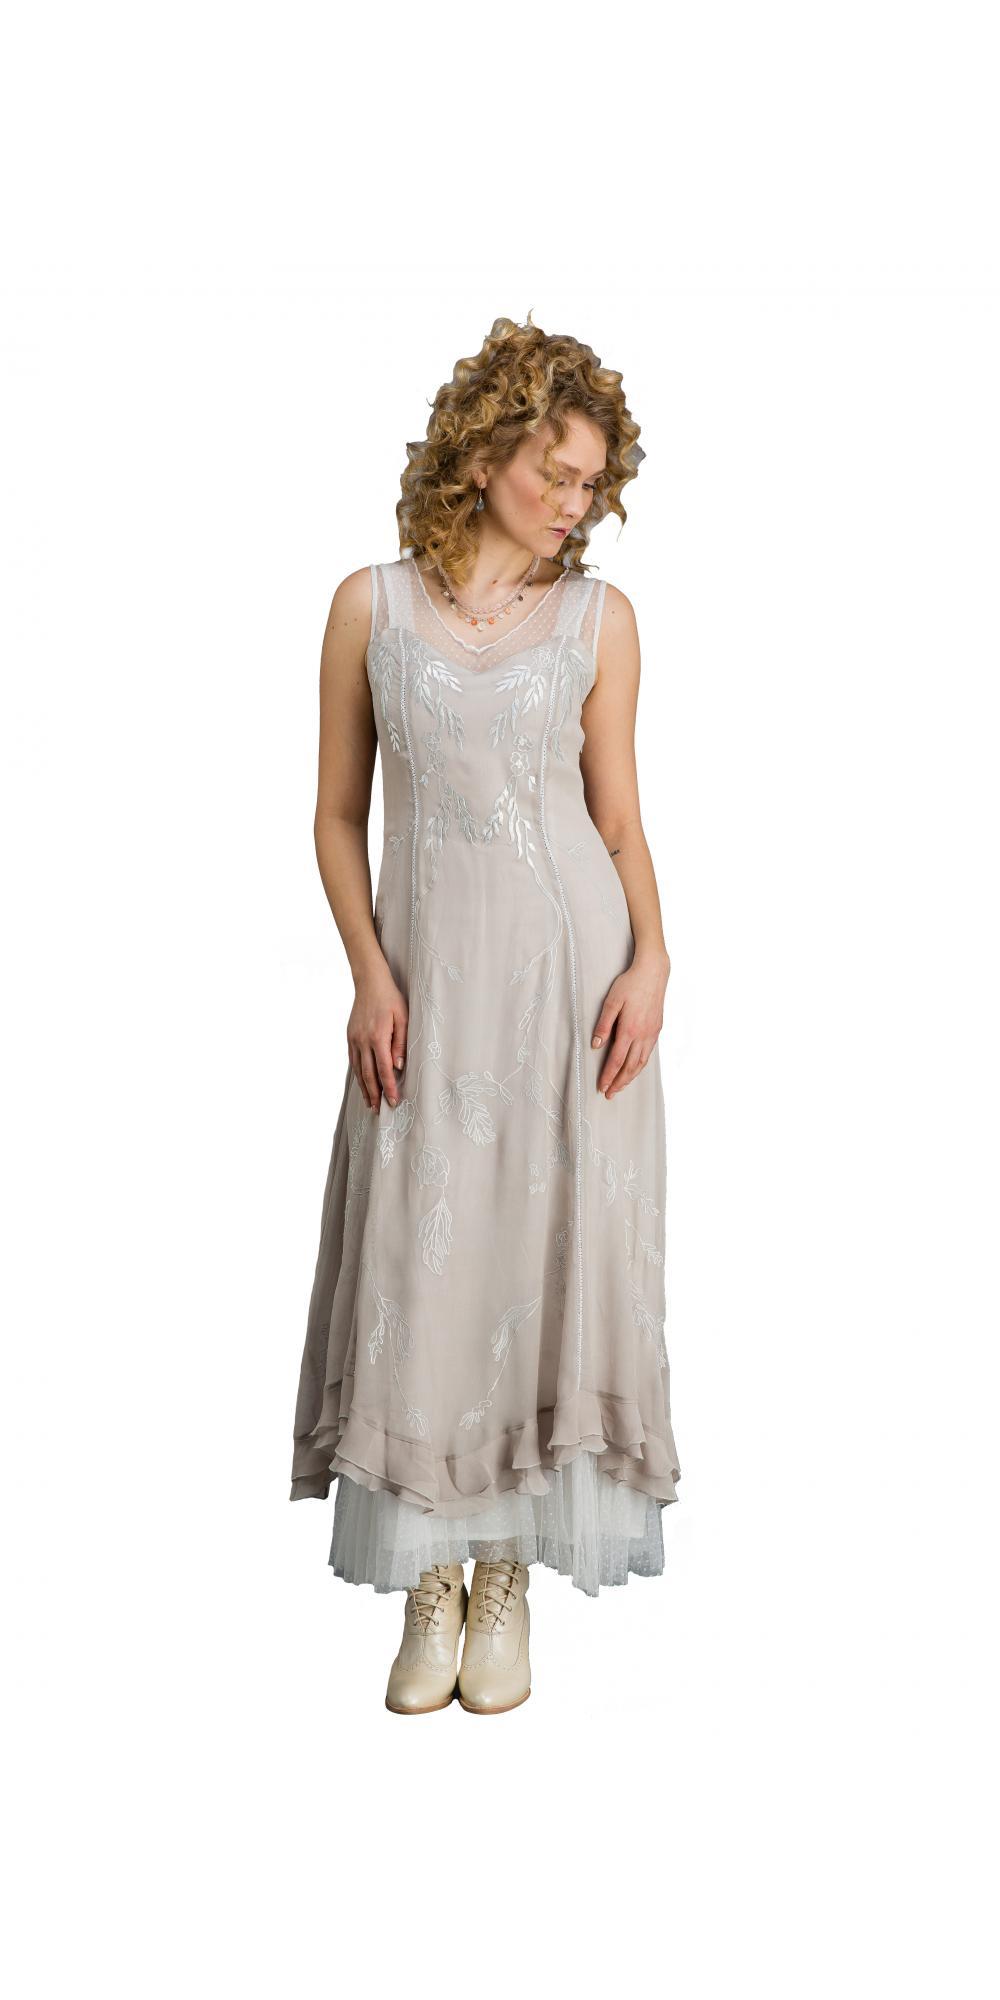 True Romance Nataya CL-069 Vintage Style Wedding Dress in ...